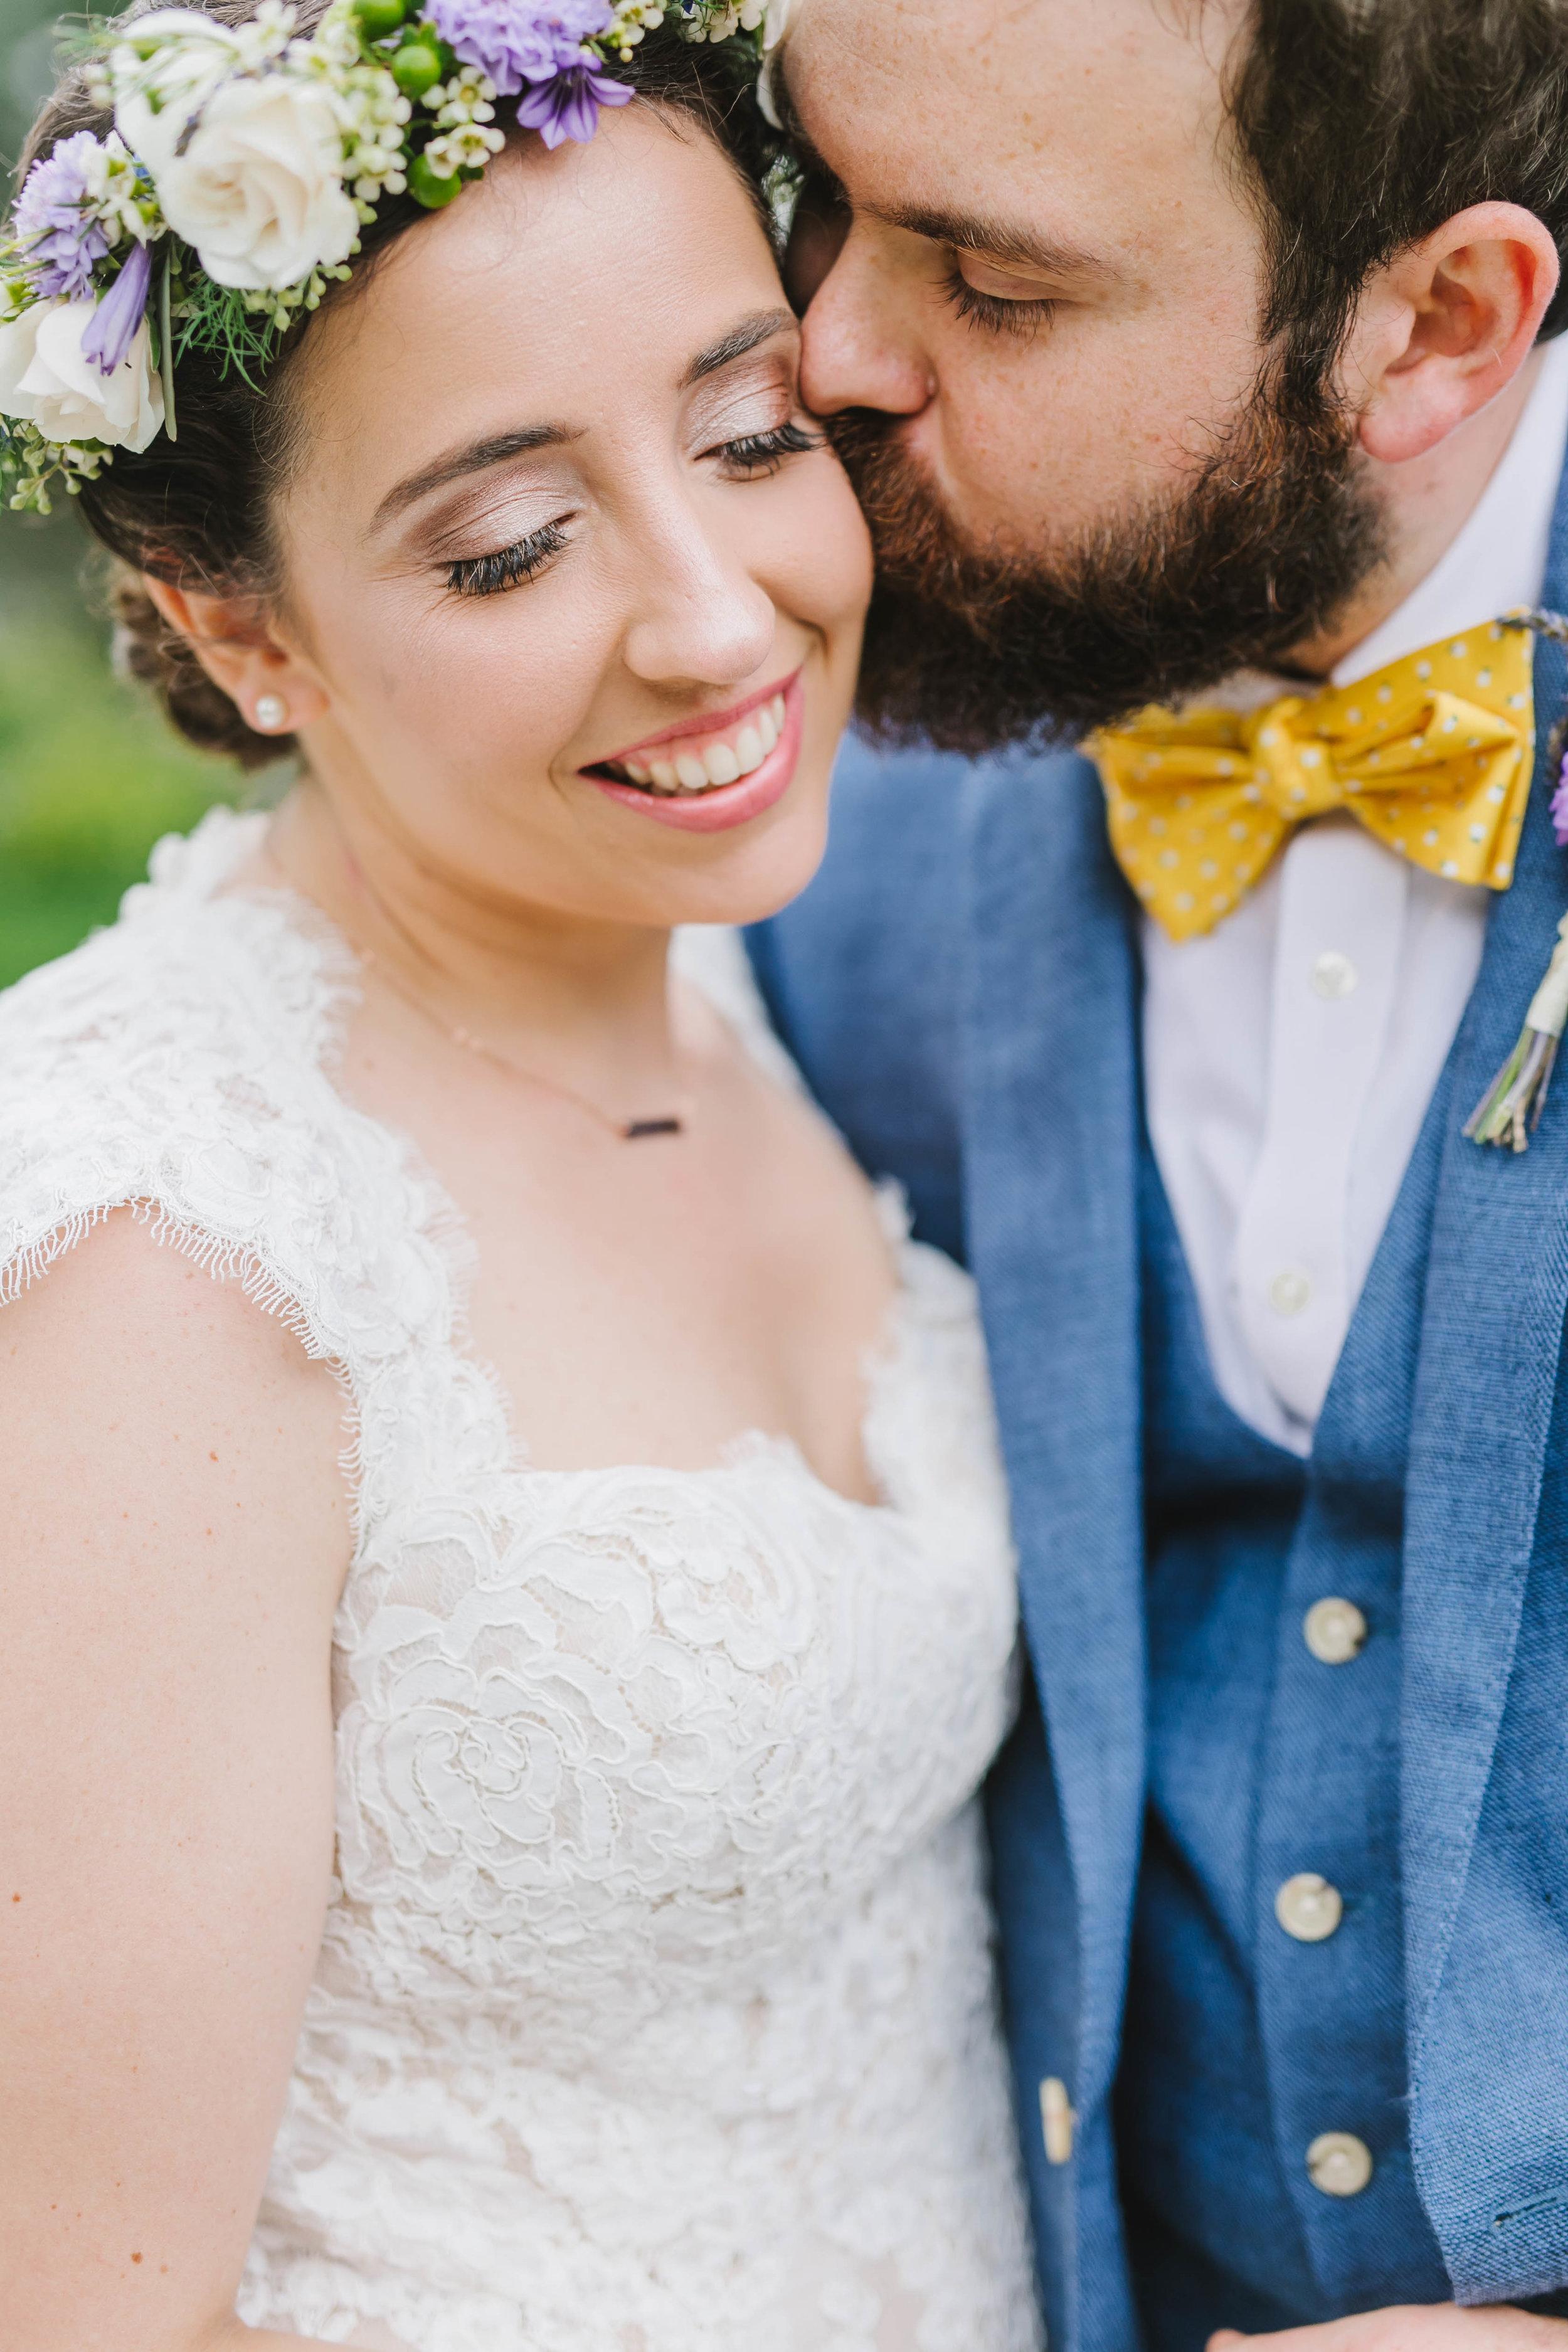 Mount Hope Farm Bristol Rhode Island RI New England Coastal Flower Crown Wedding - Emily Tebbetts Photography-5.jpg